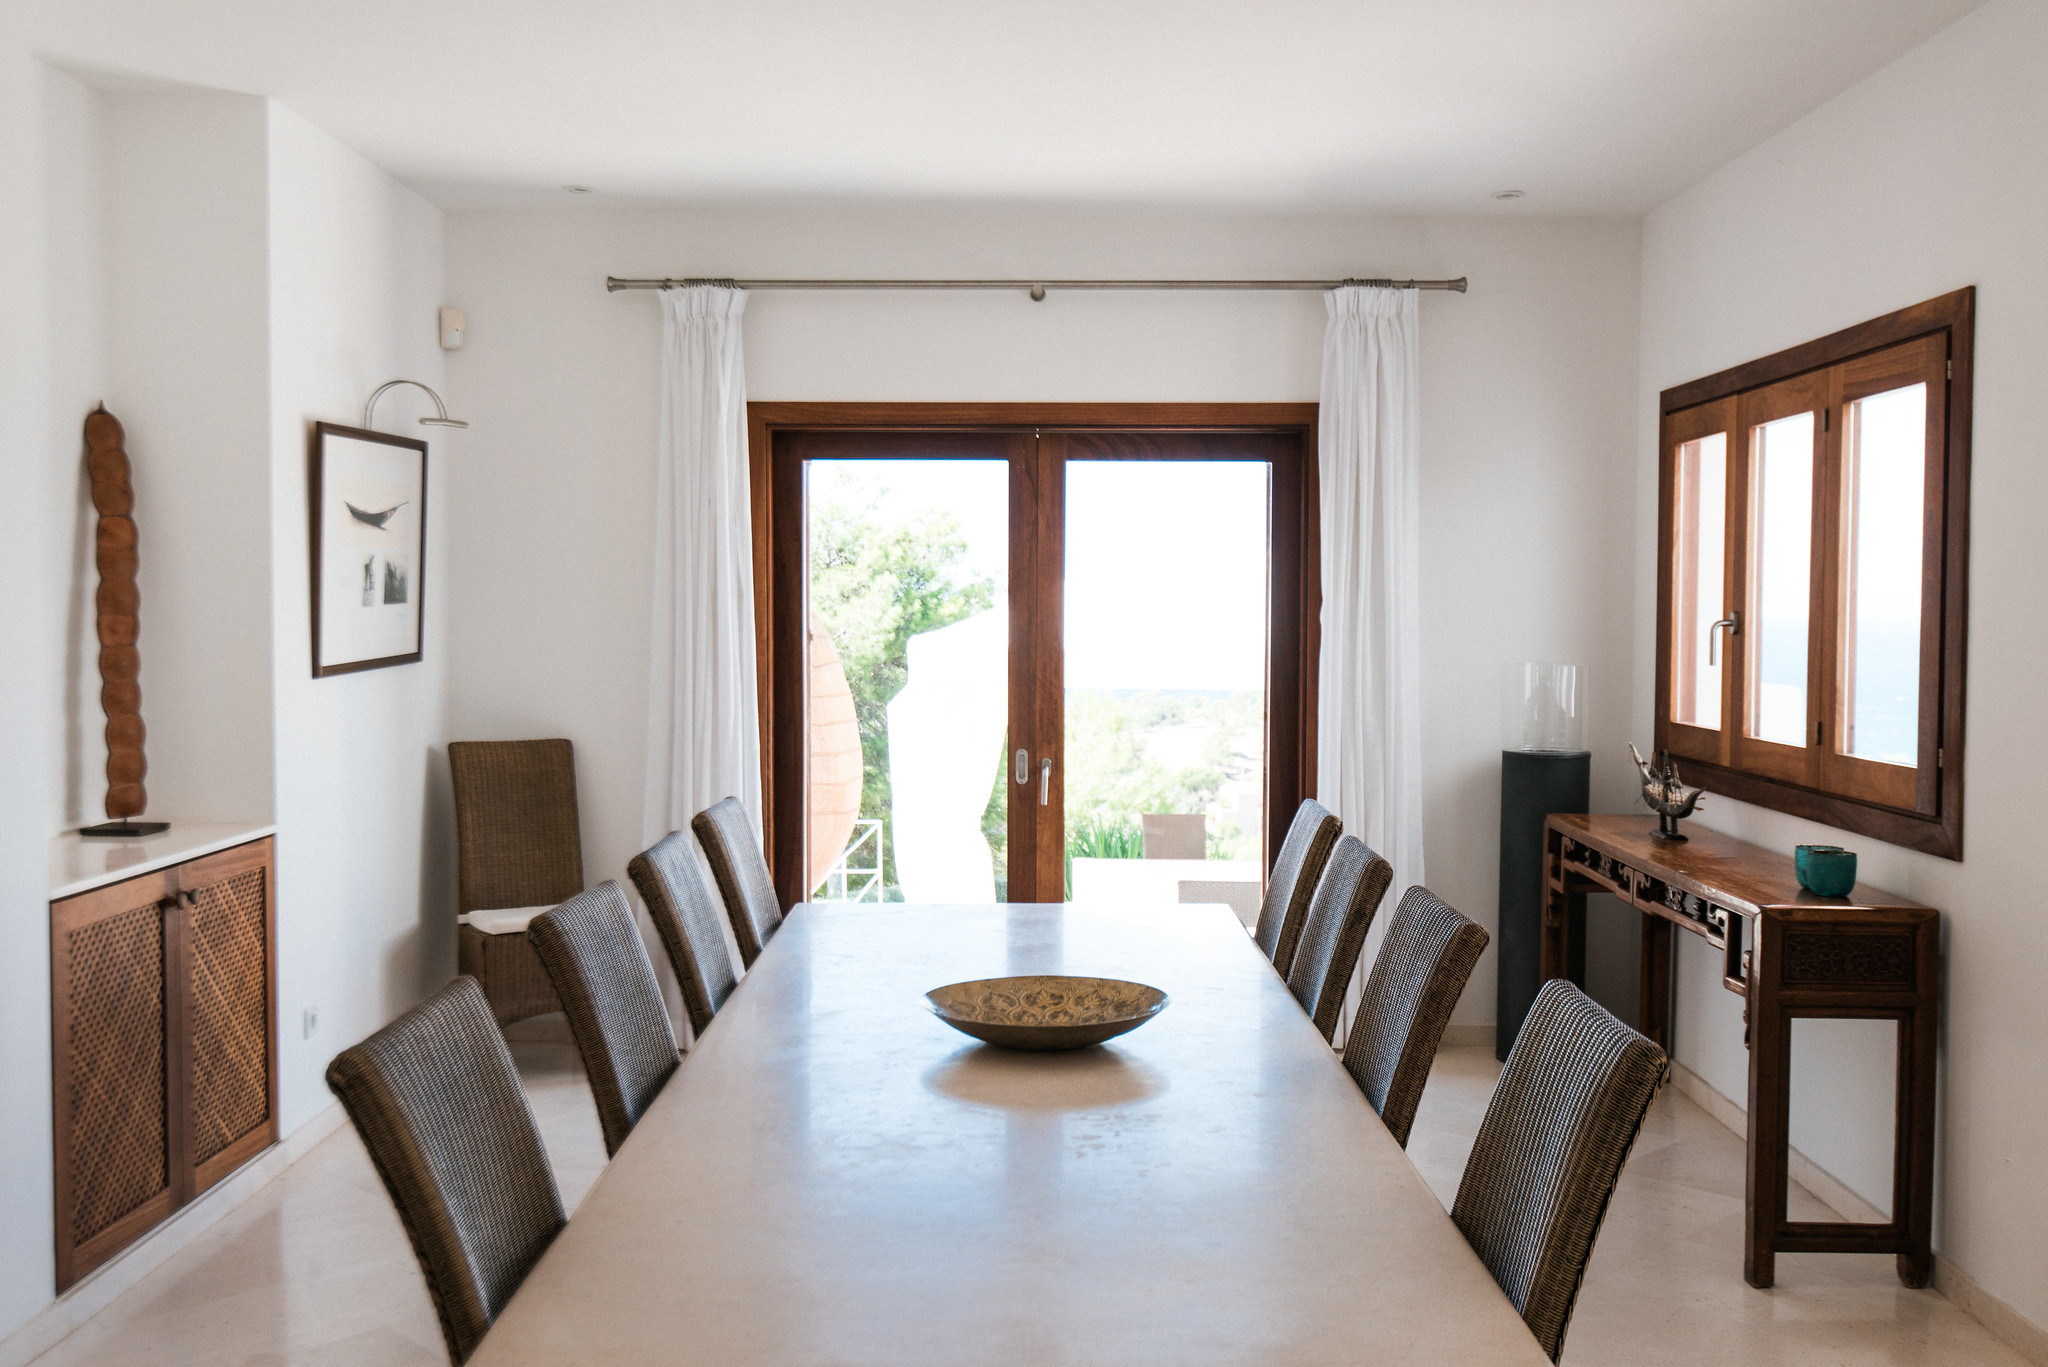 https://www.white-ibiza.com/wp-content/uploads/2020/05/white-ibiza-villas-can-ava-inside-dining.jpg